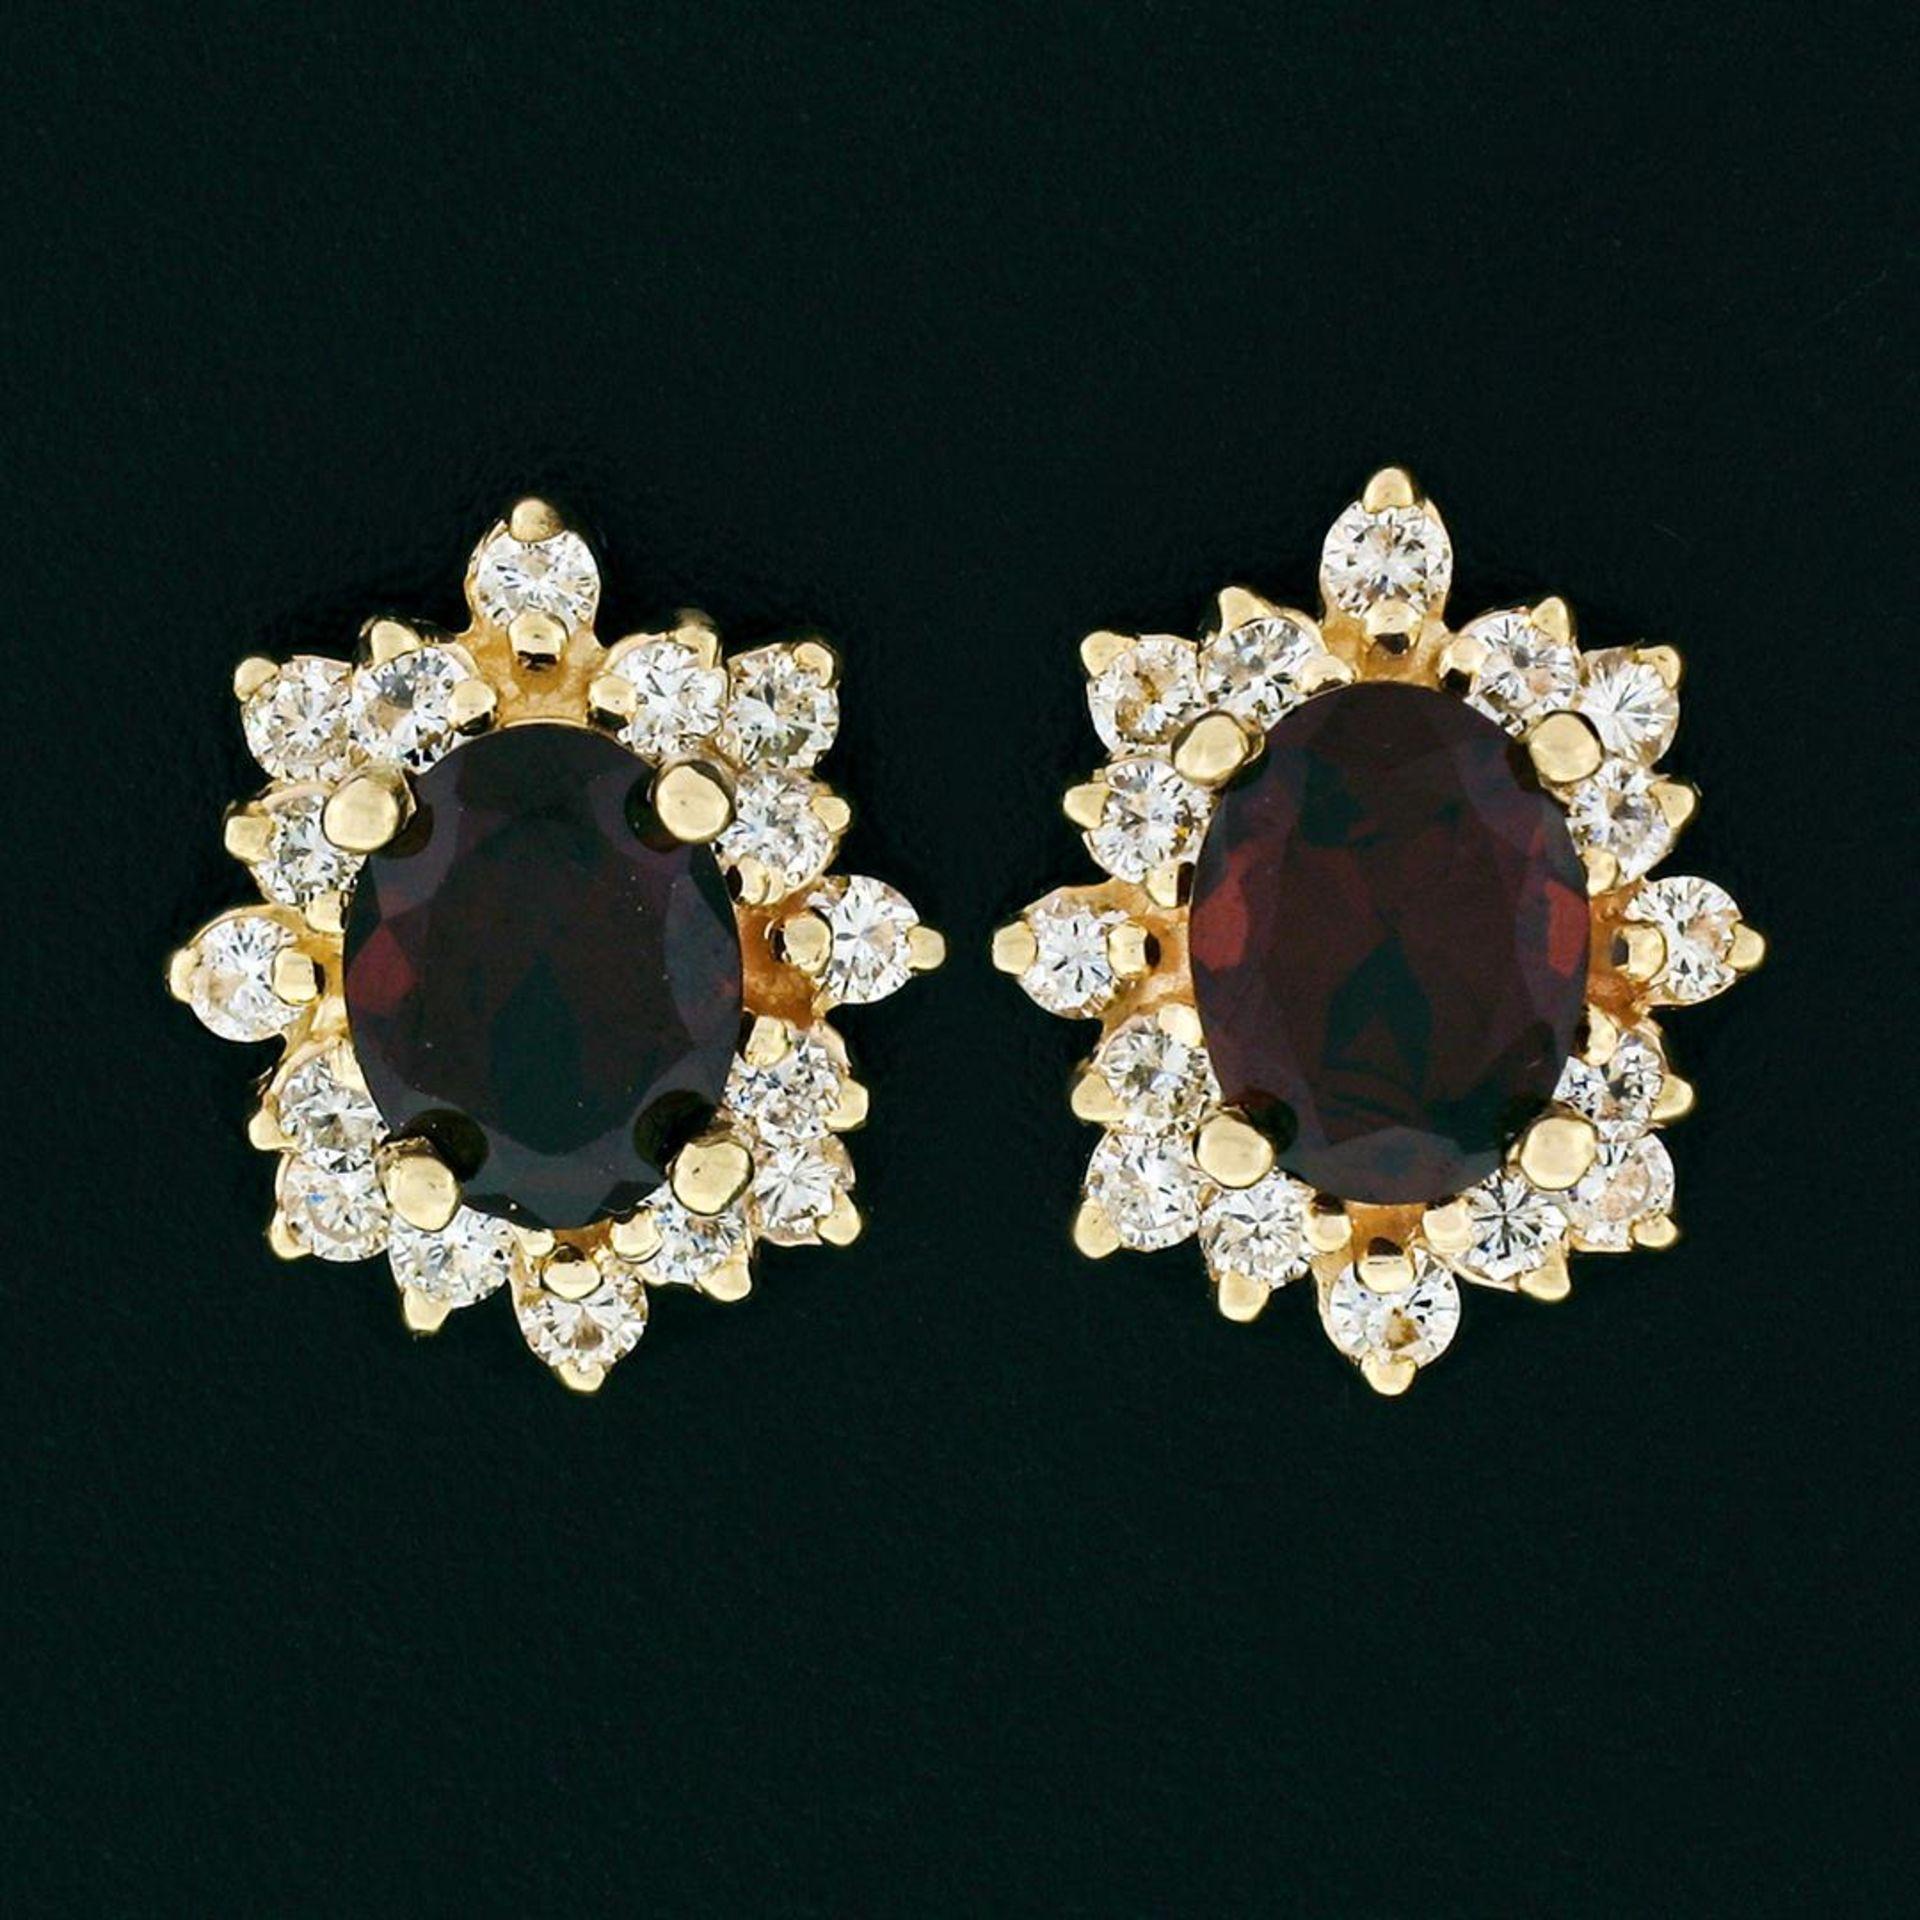 14k Yellow Gold 3.80ctw Oval Garnet & Layered Round Diamond Halo Stud Earrings - Image 2 of 5